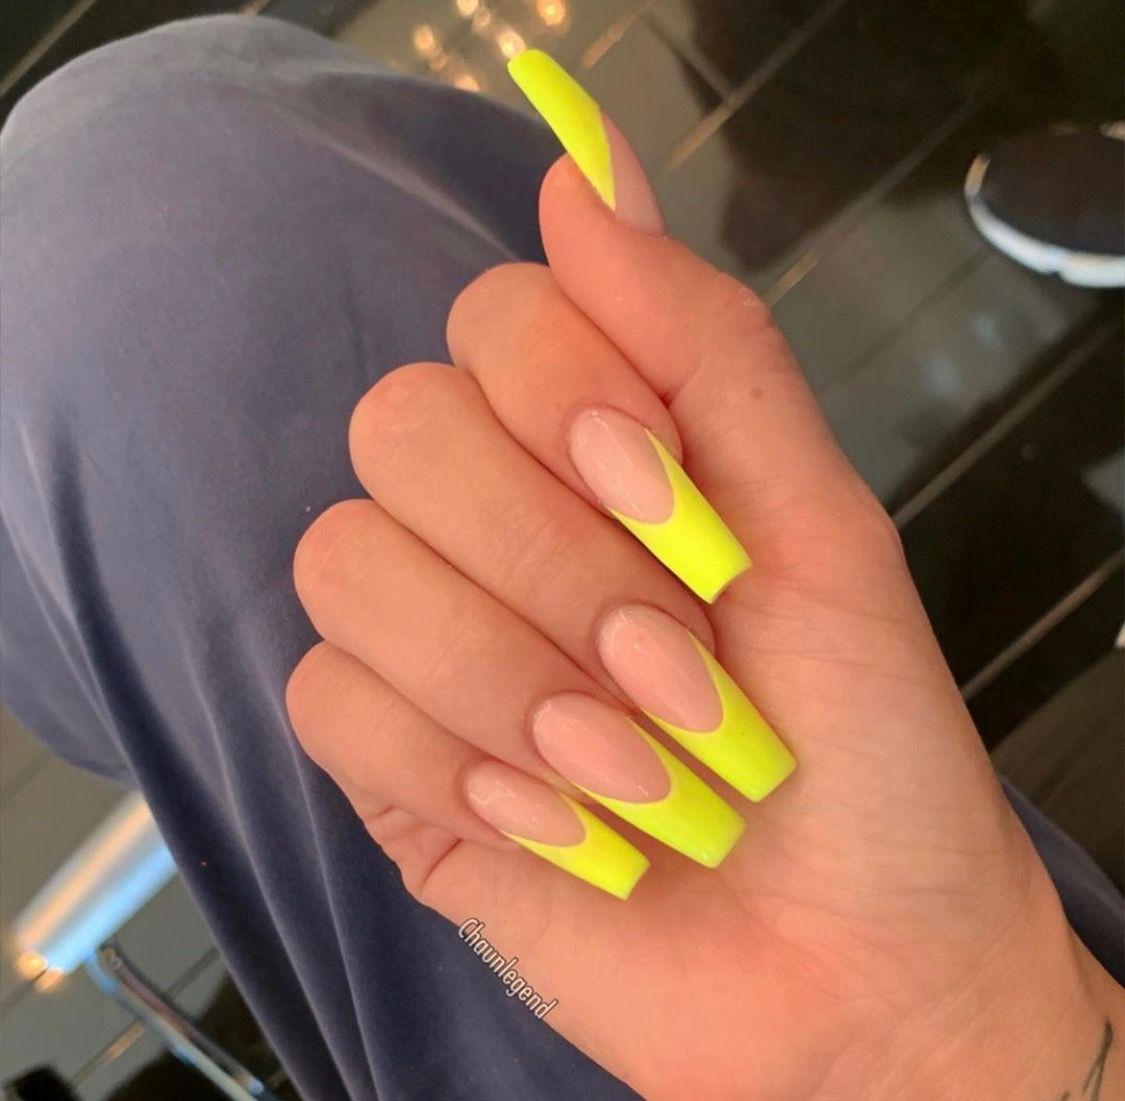 52 Gorgeous Coffin French Tip Nail Designs Fake Nails French Tip Nail Designs Yellow Nails